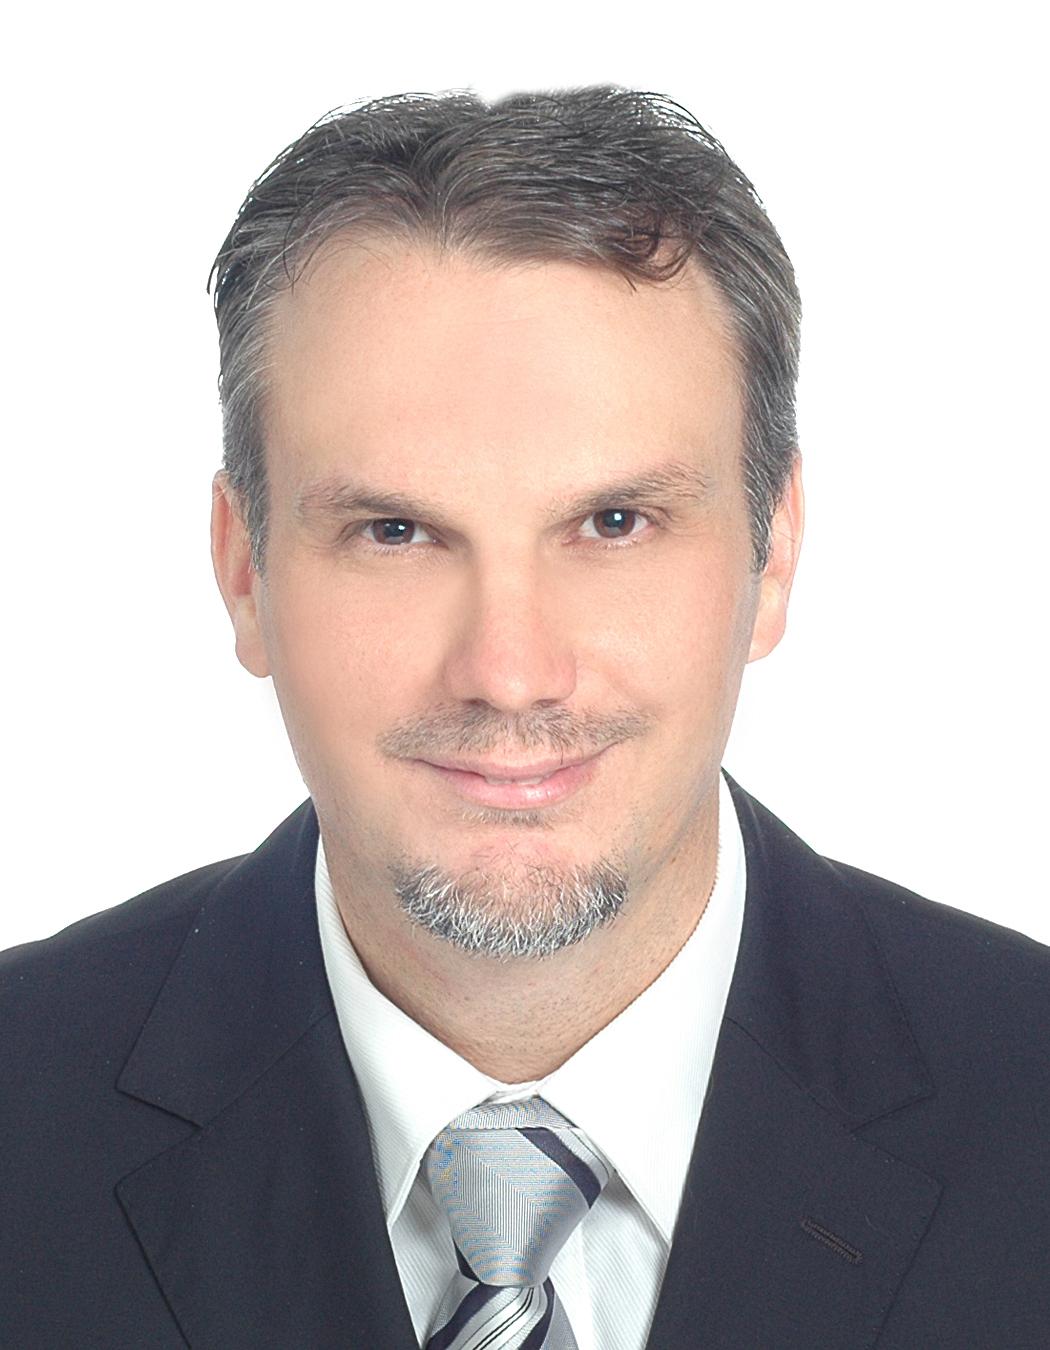 Tim Alden